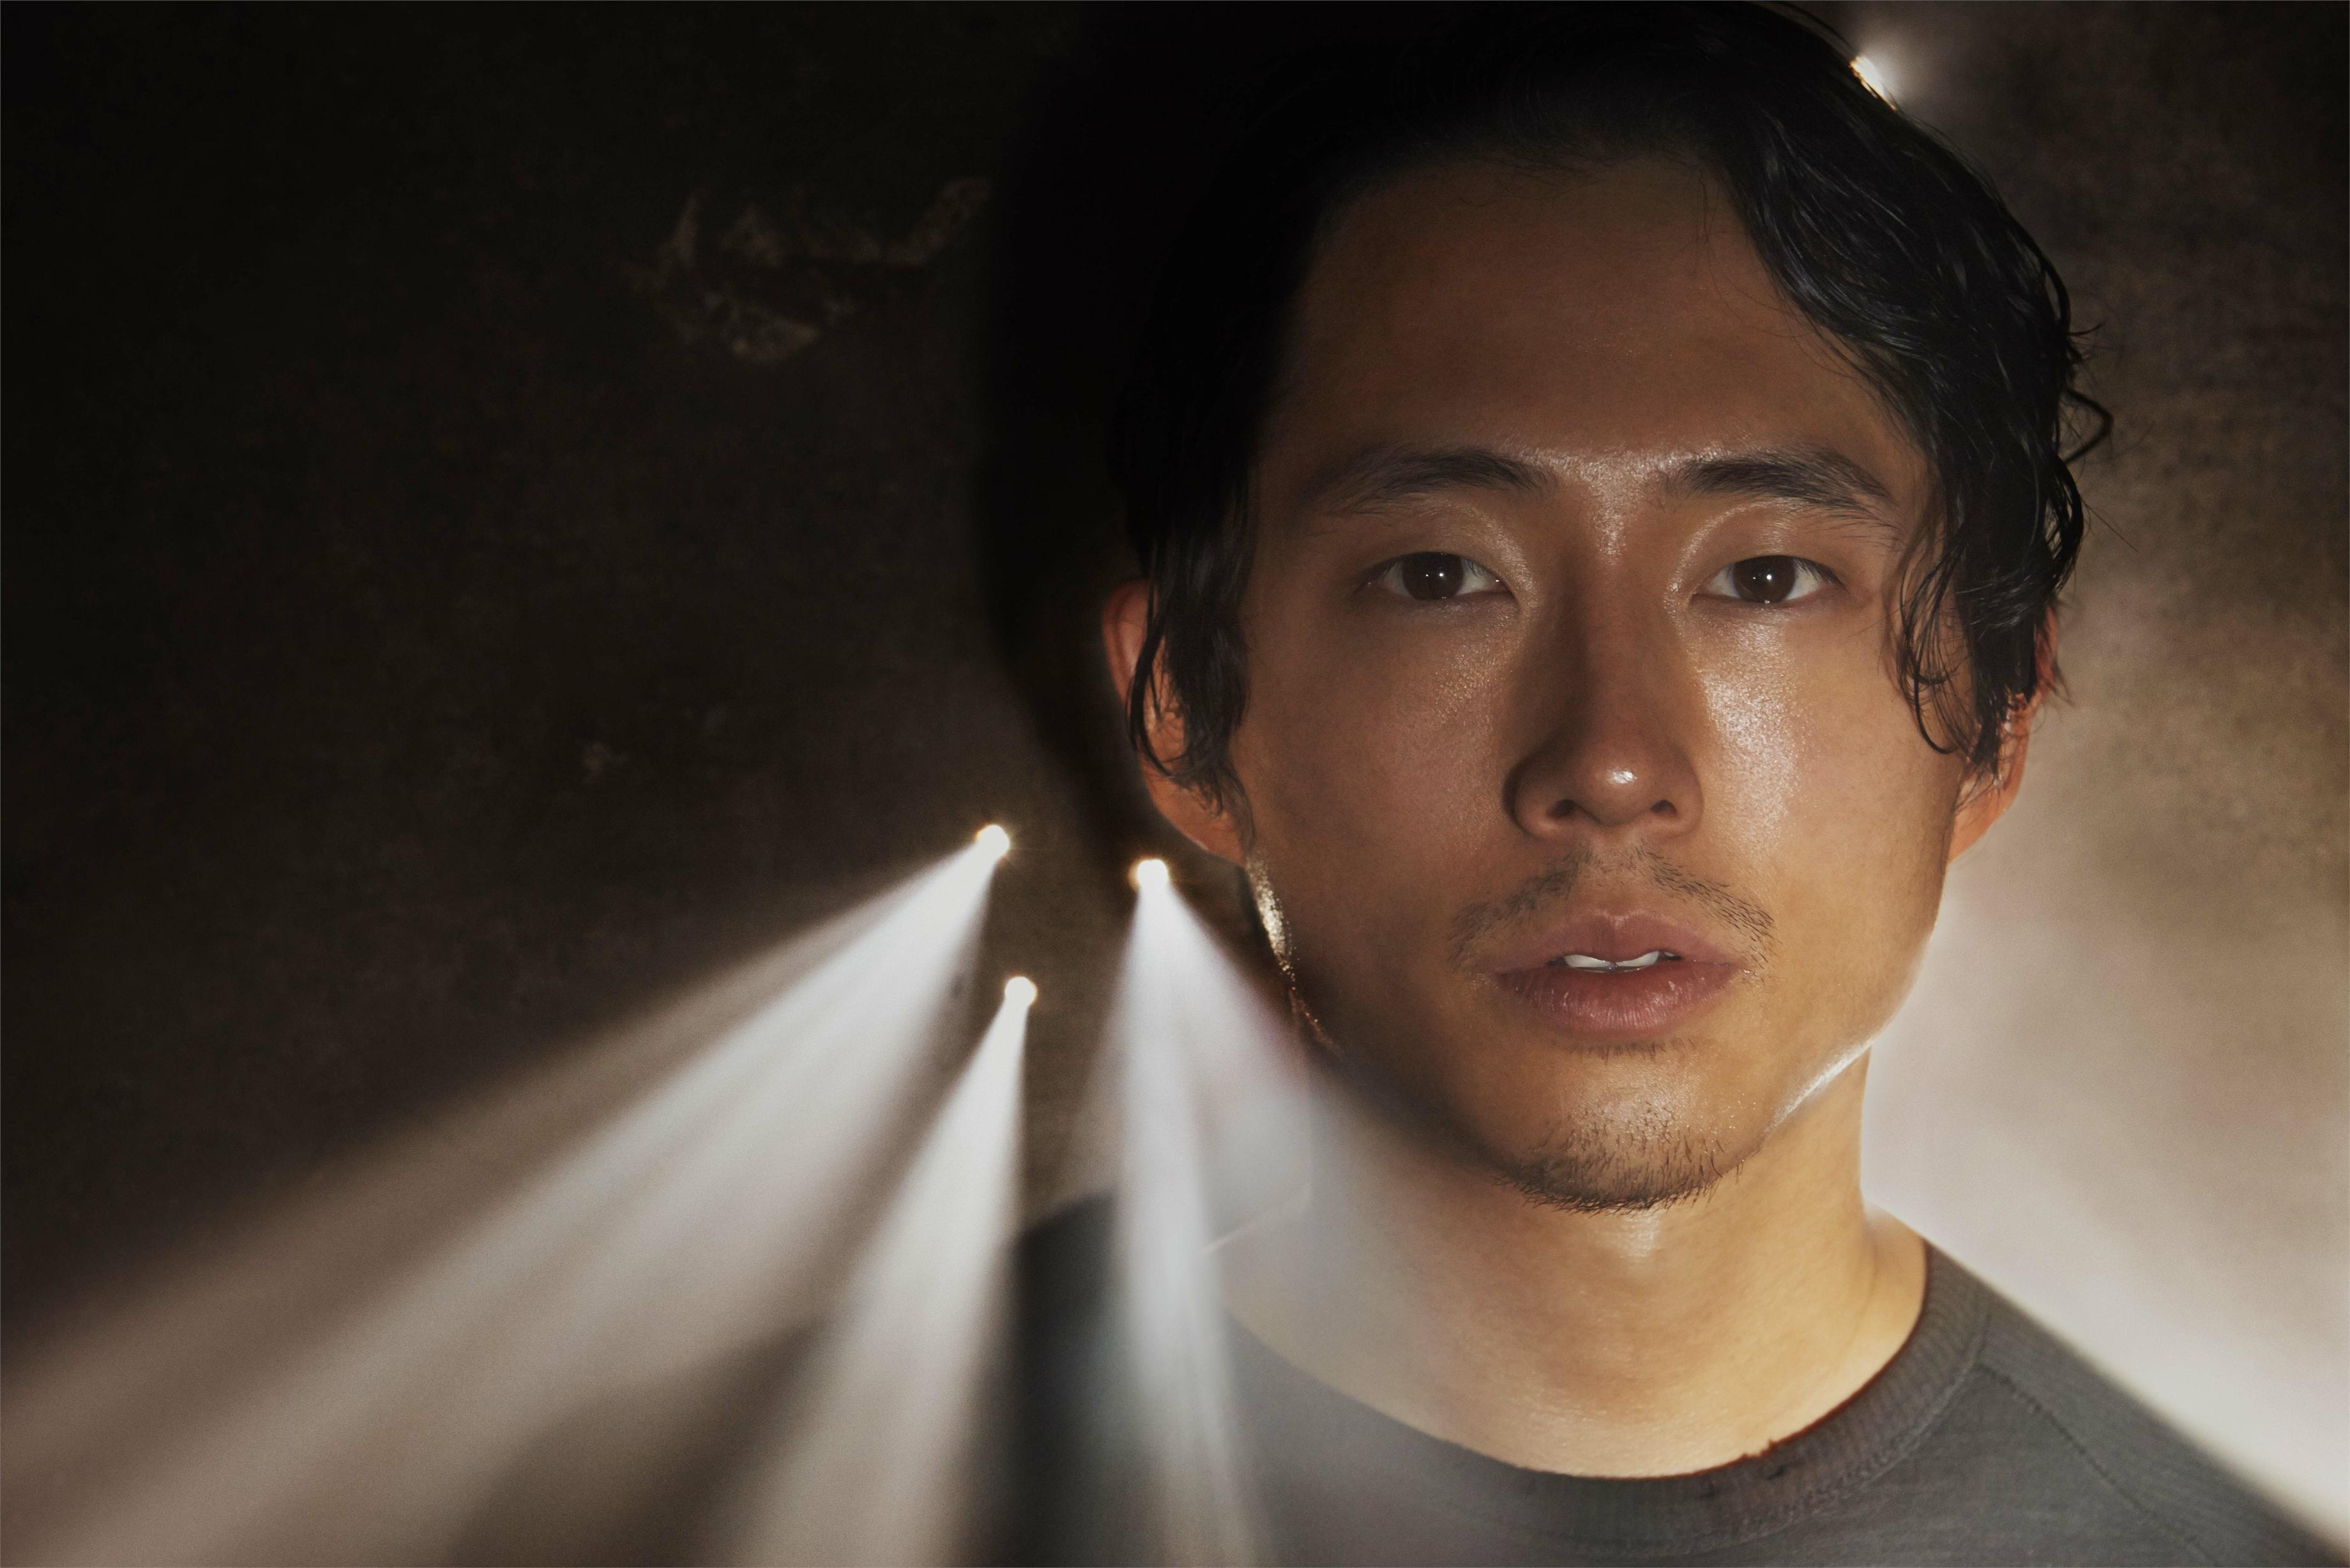 Glenn-Rhee-The-Walking-Dead-5-Temporada-Personagens-HQ-001